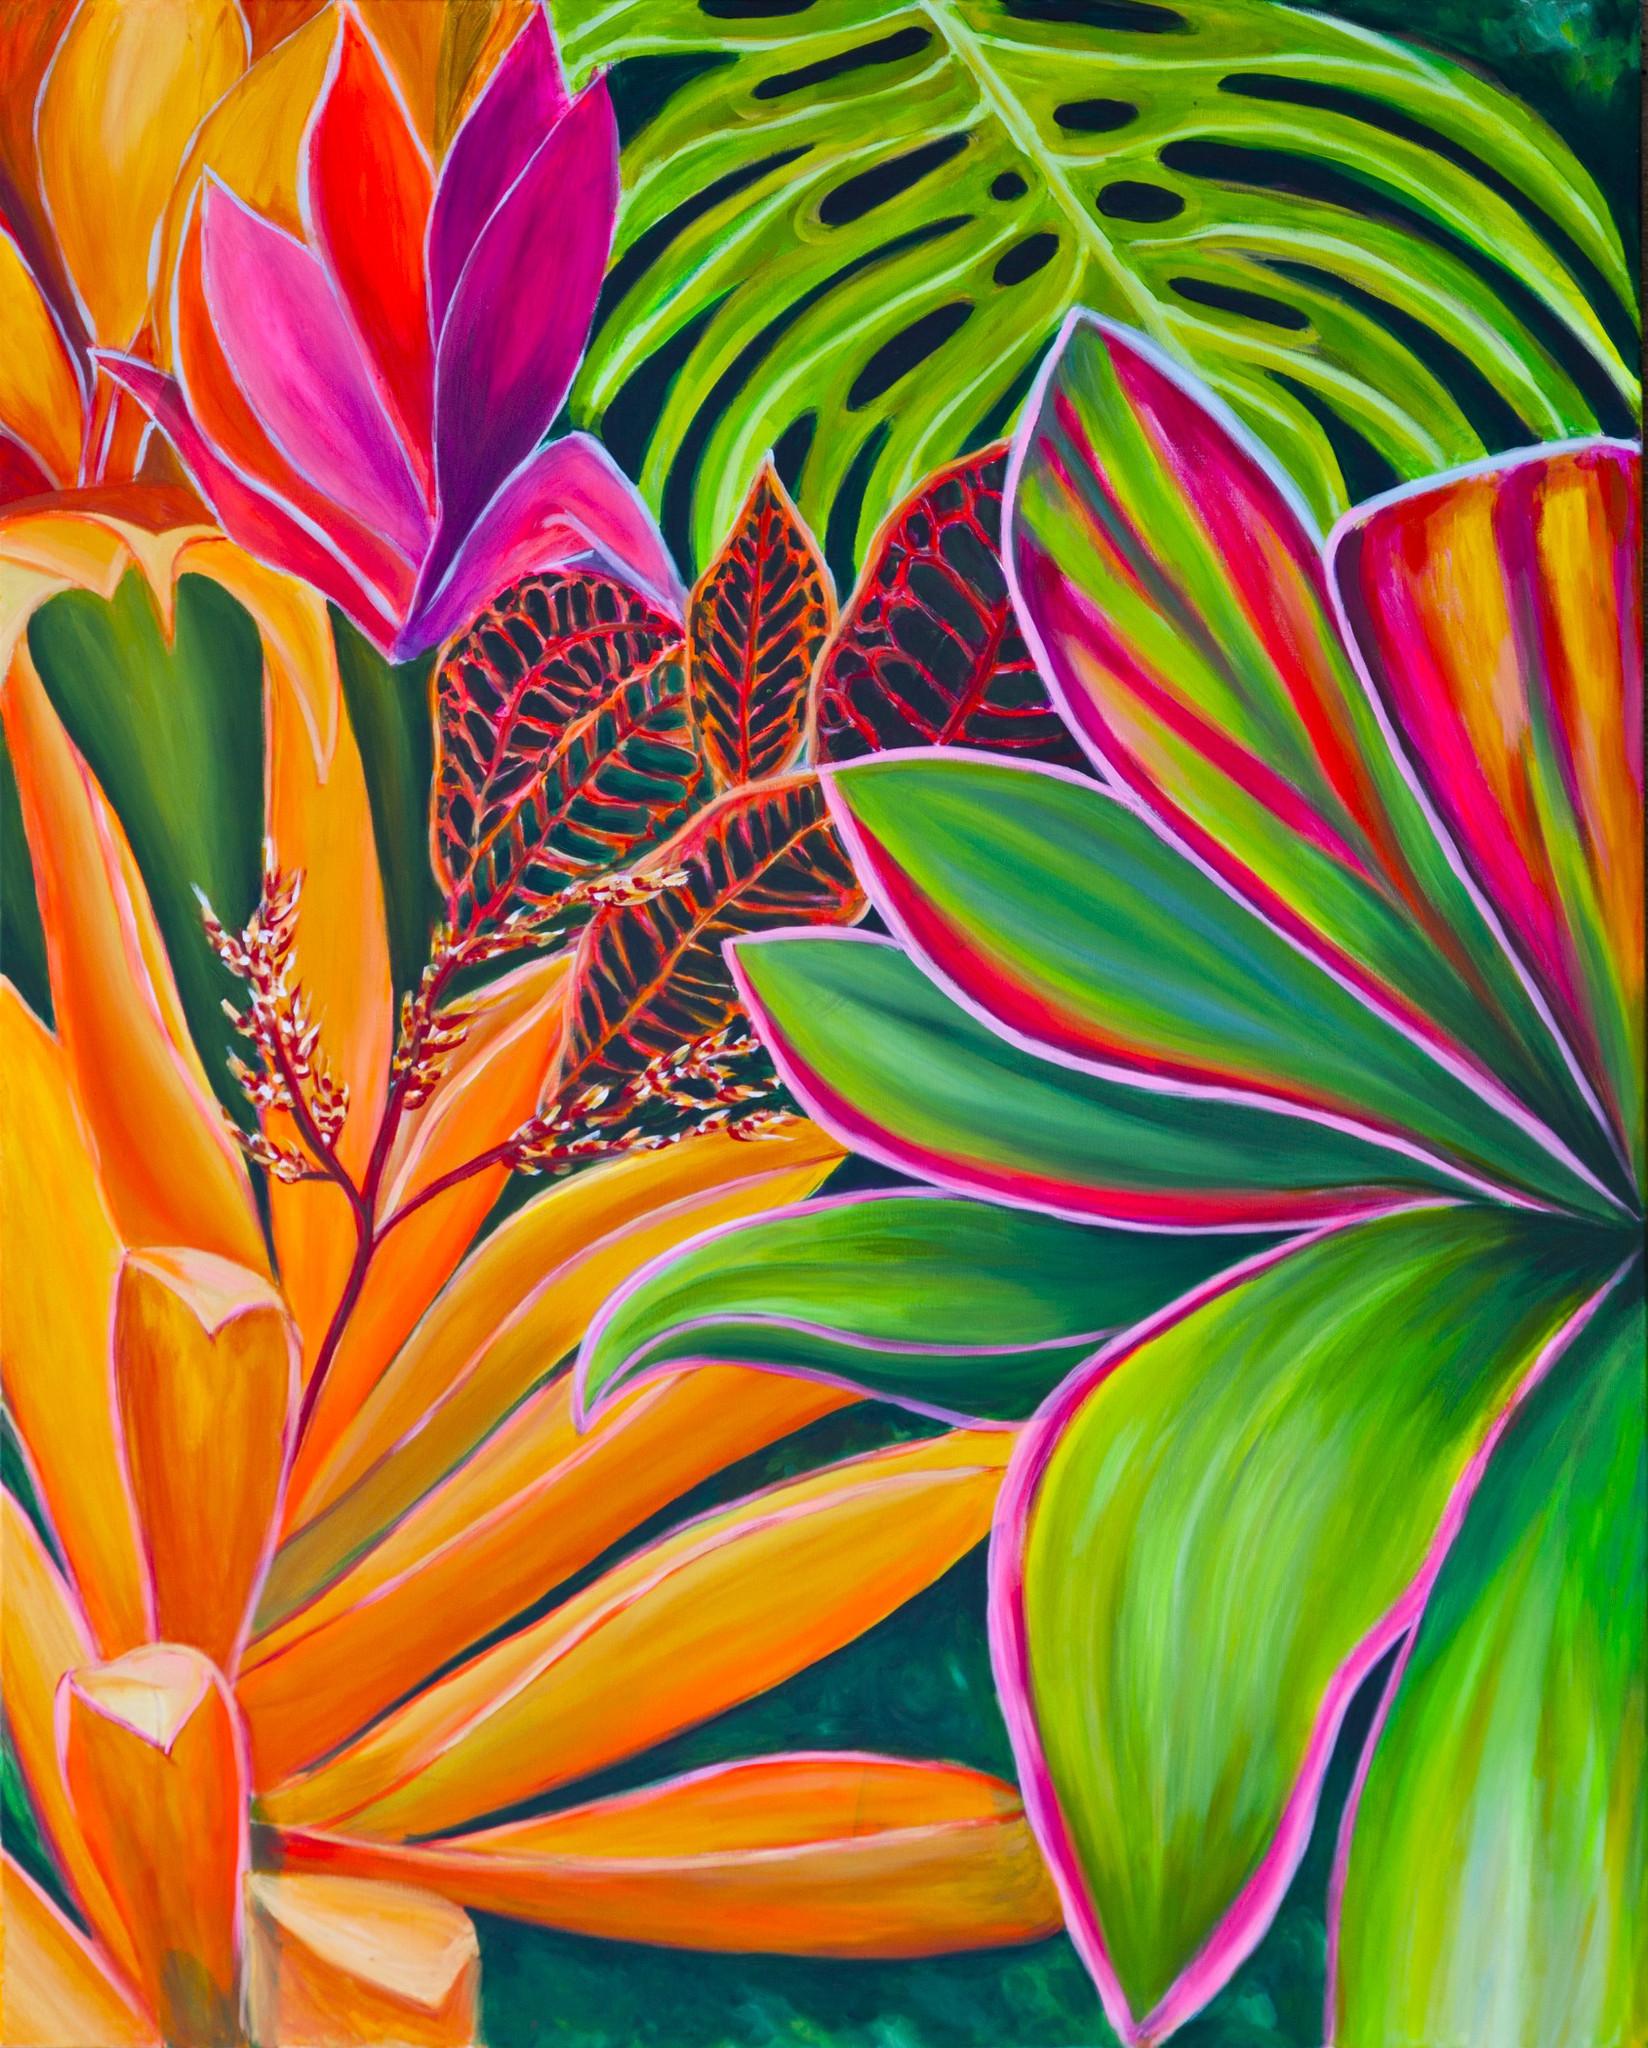 Tropical flower artwork vector royalty free Maui Tropical Flowers - MICHAL ABRAMOVITZ contemporary art vector royalty free